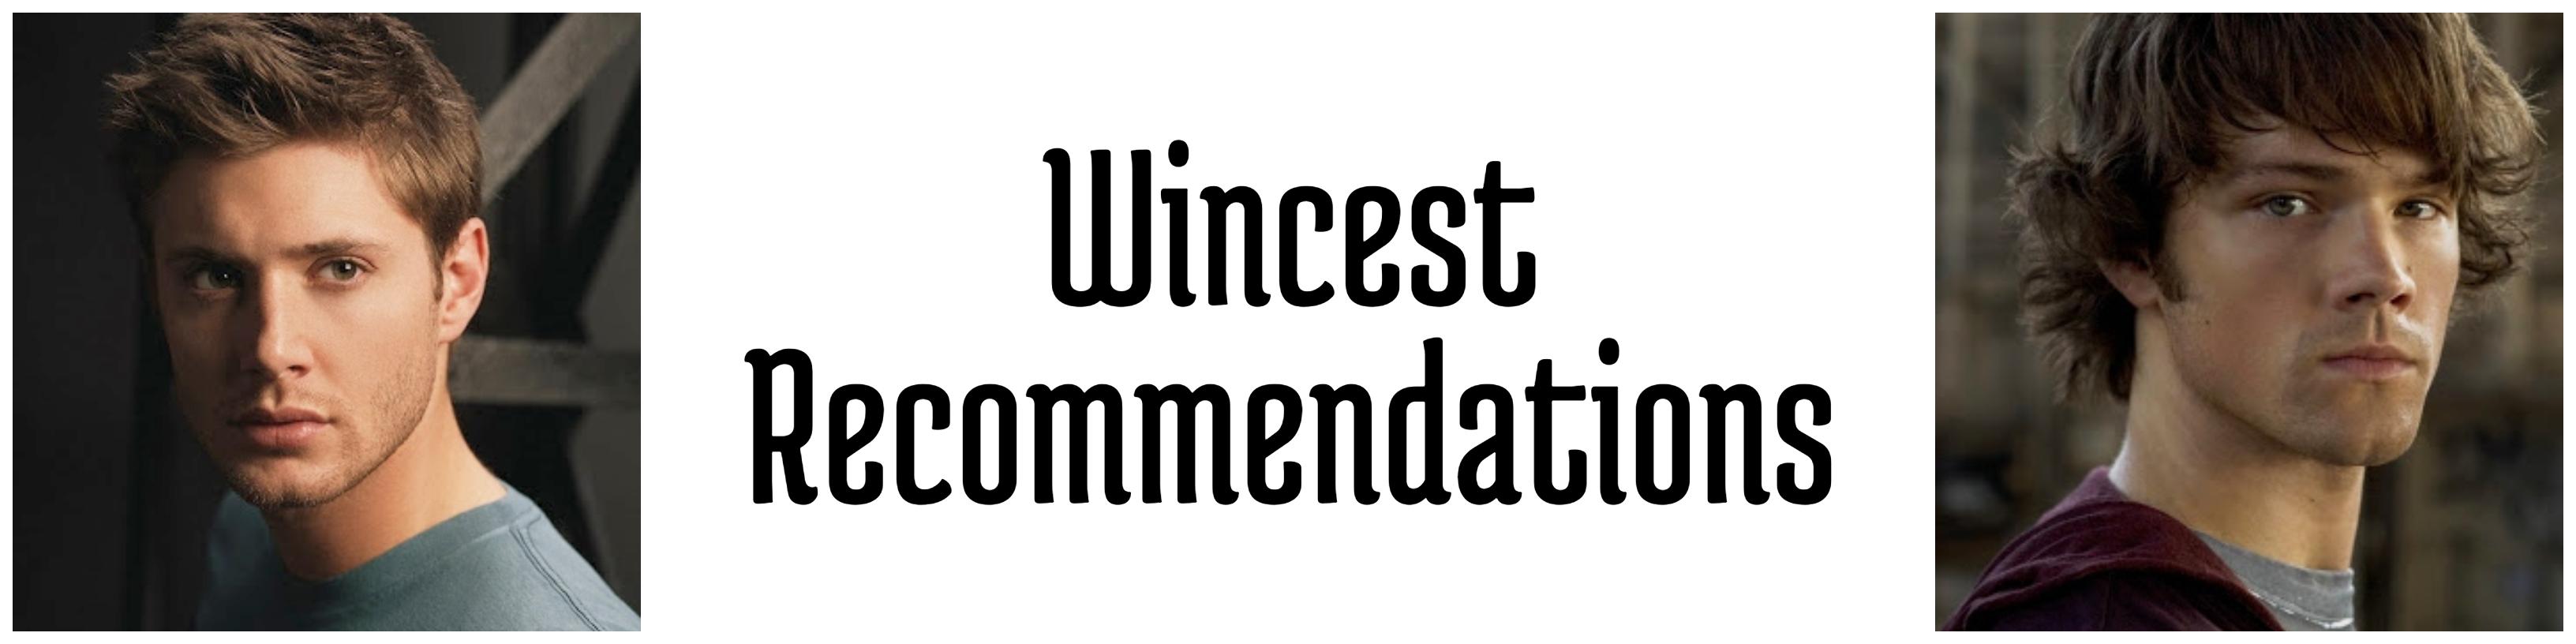 Wincest Banner